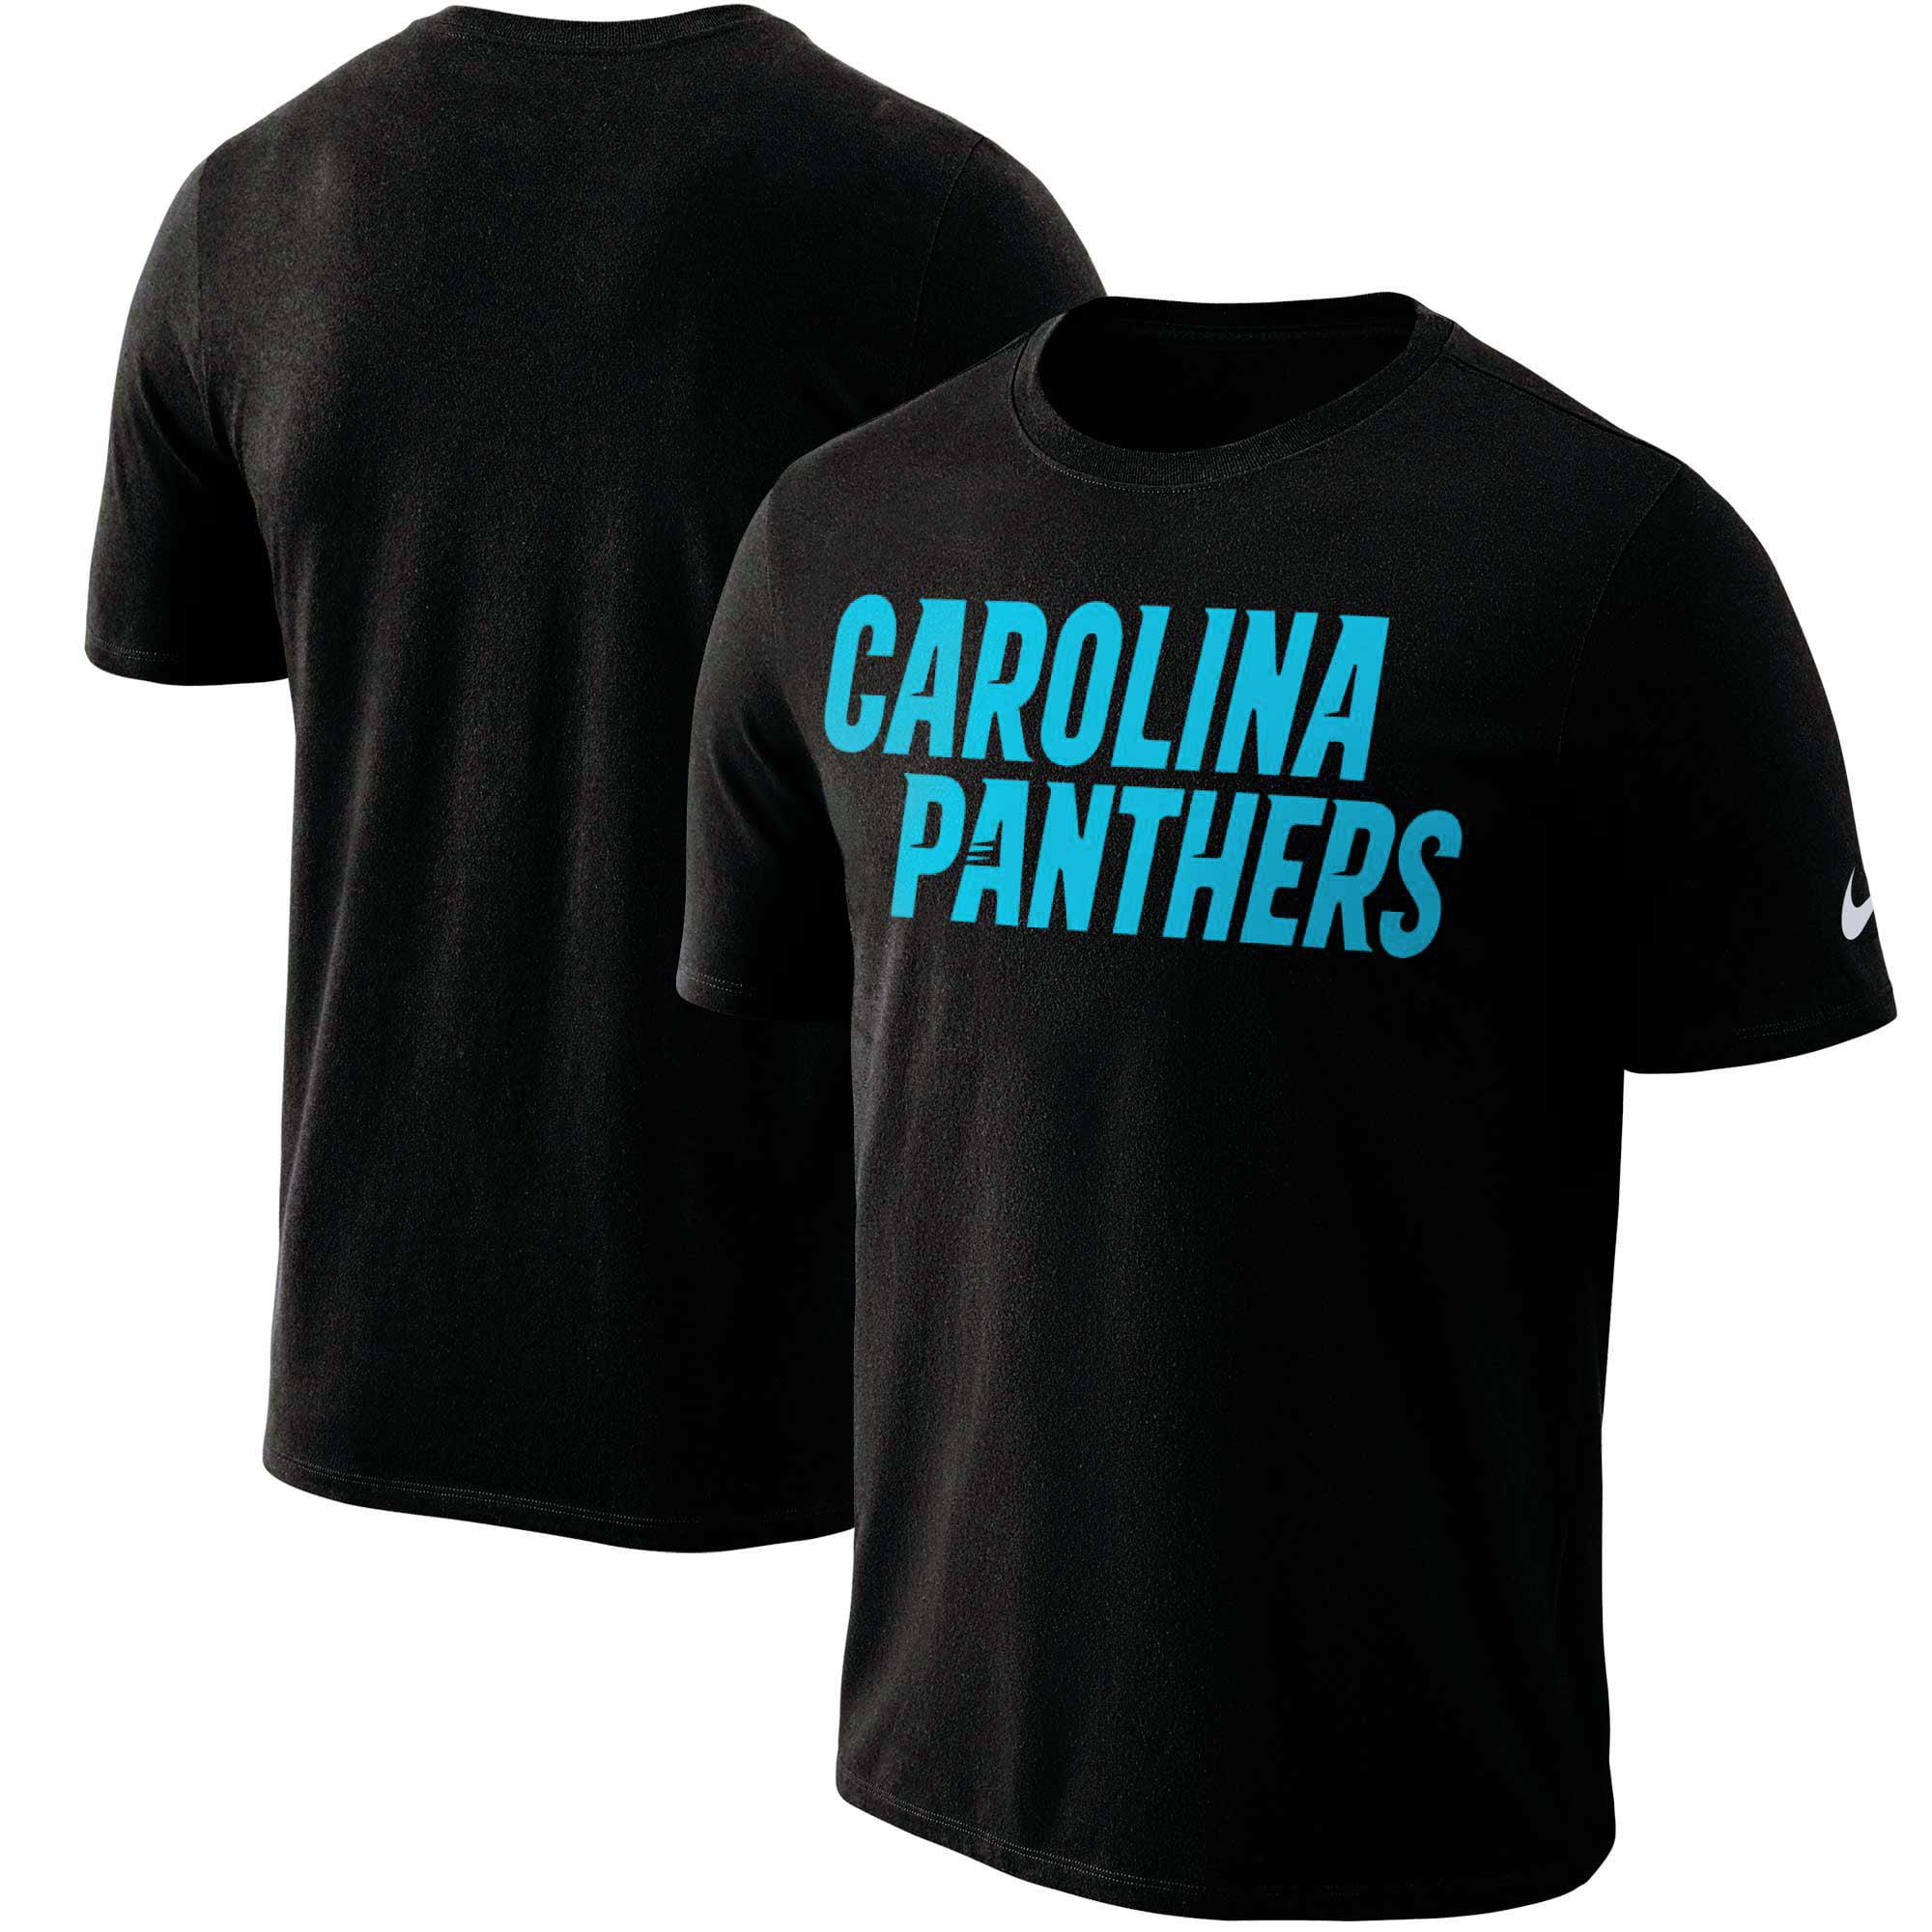 Carolina Panthers Nike Dri-FIT Cotton Essential Wordmark T-Shirt - Black